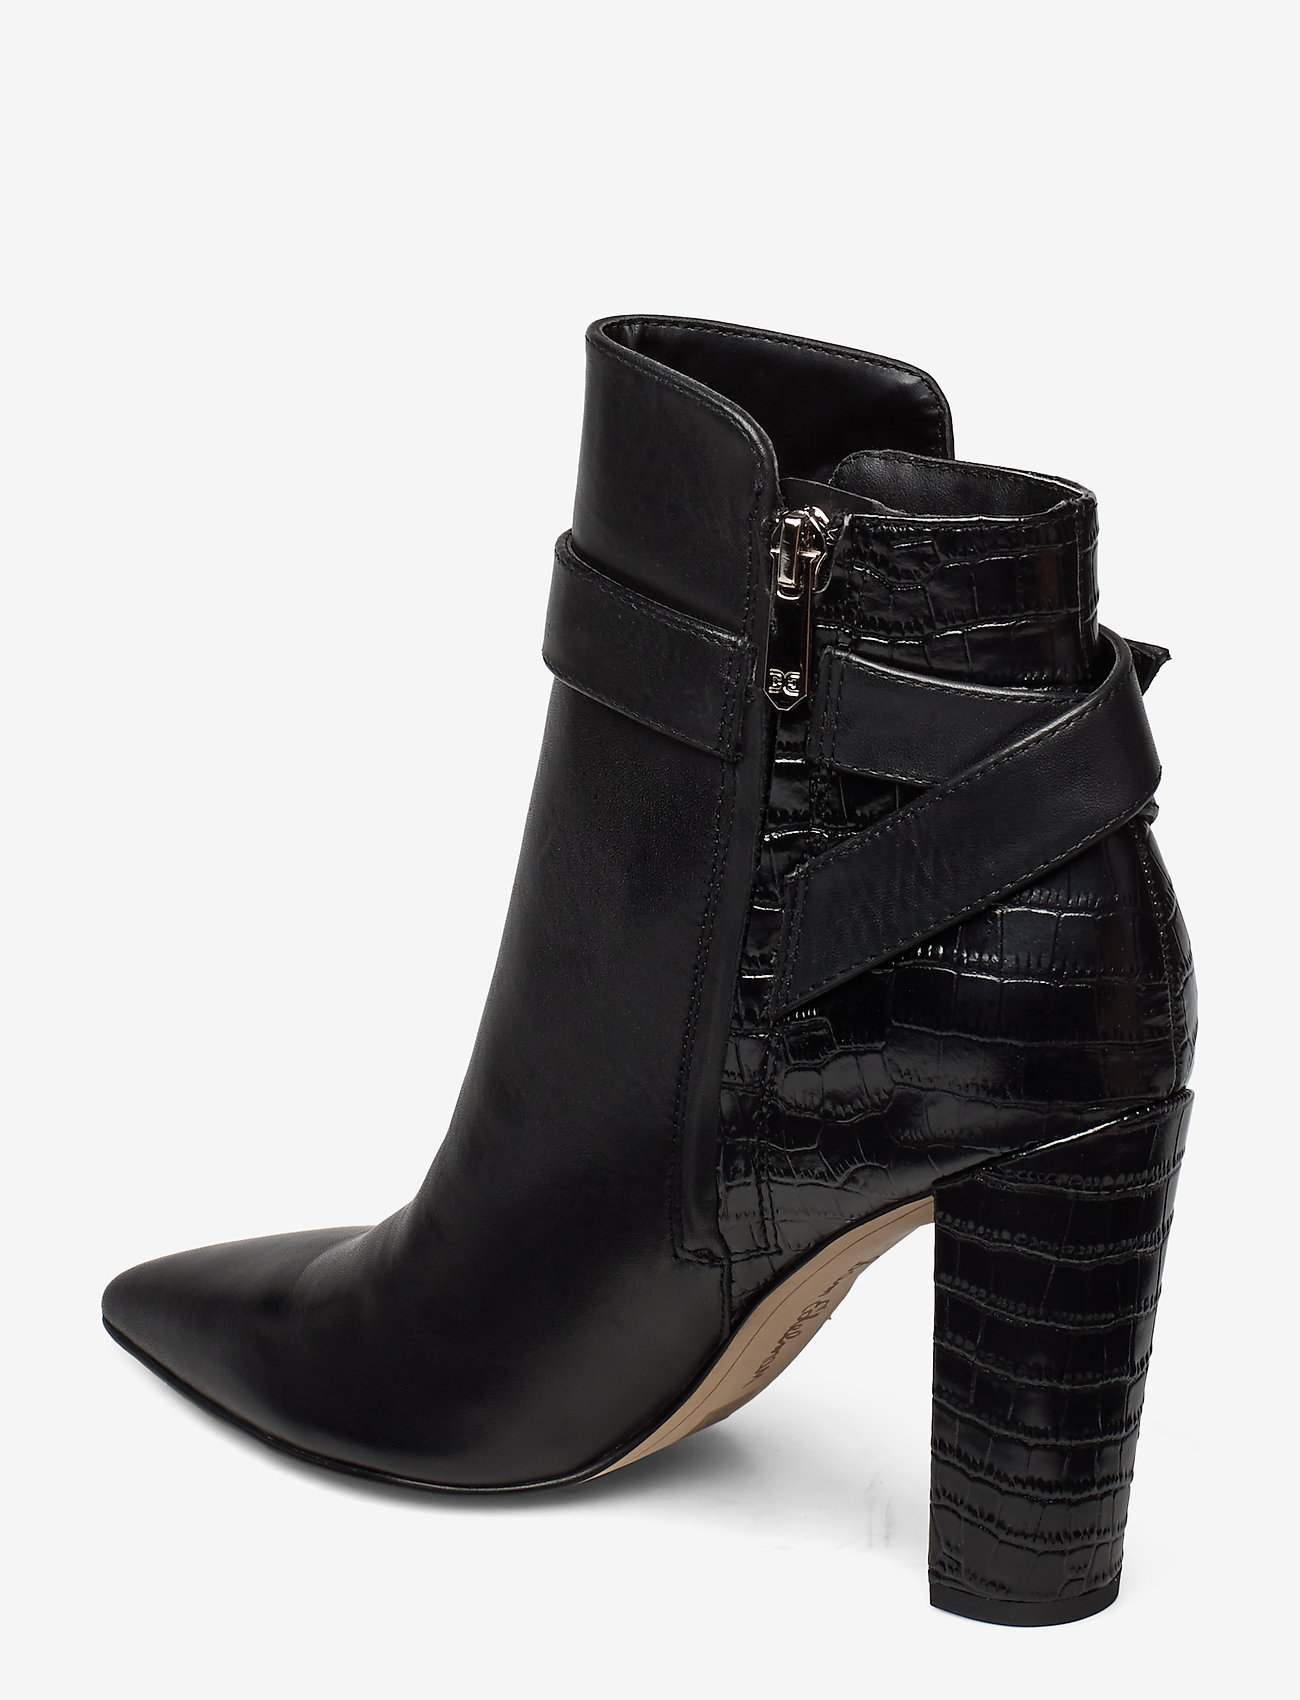 Sam Edelman RITA - Stiefel BLACK - Schuhe Billige